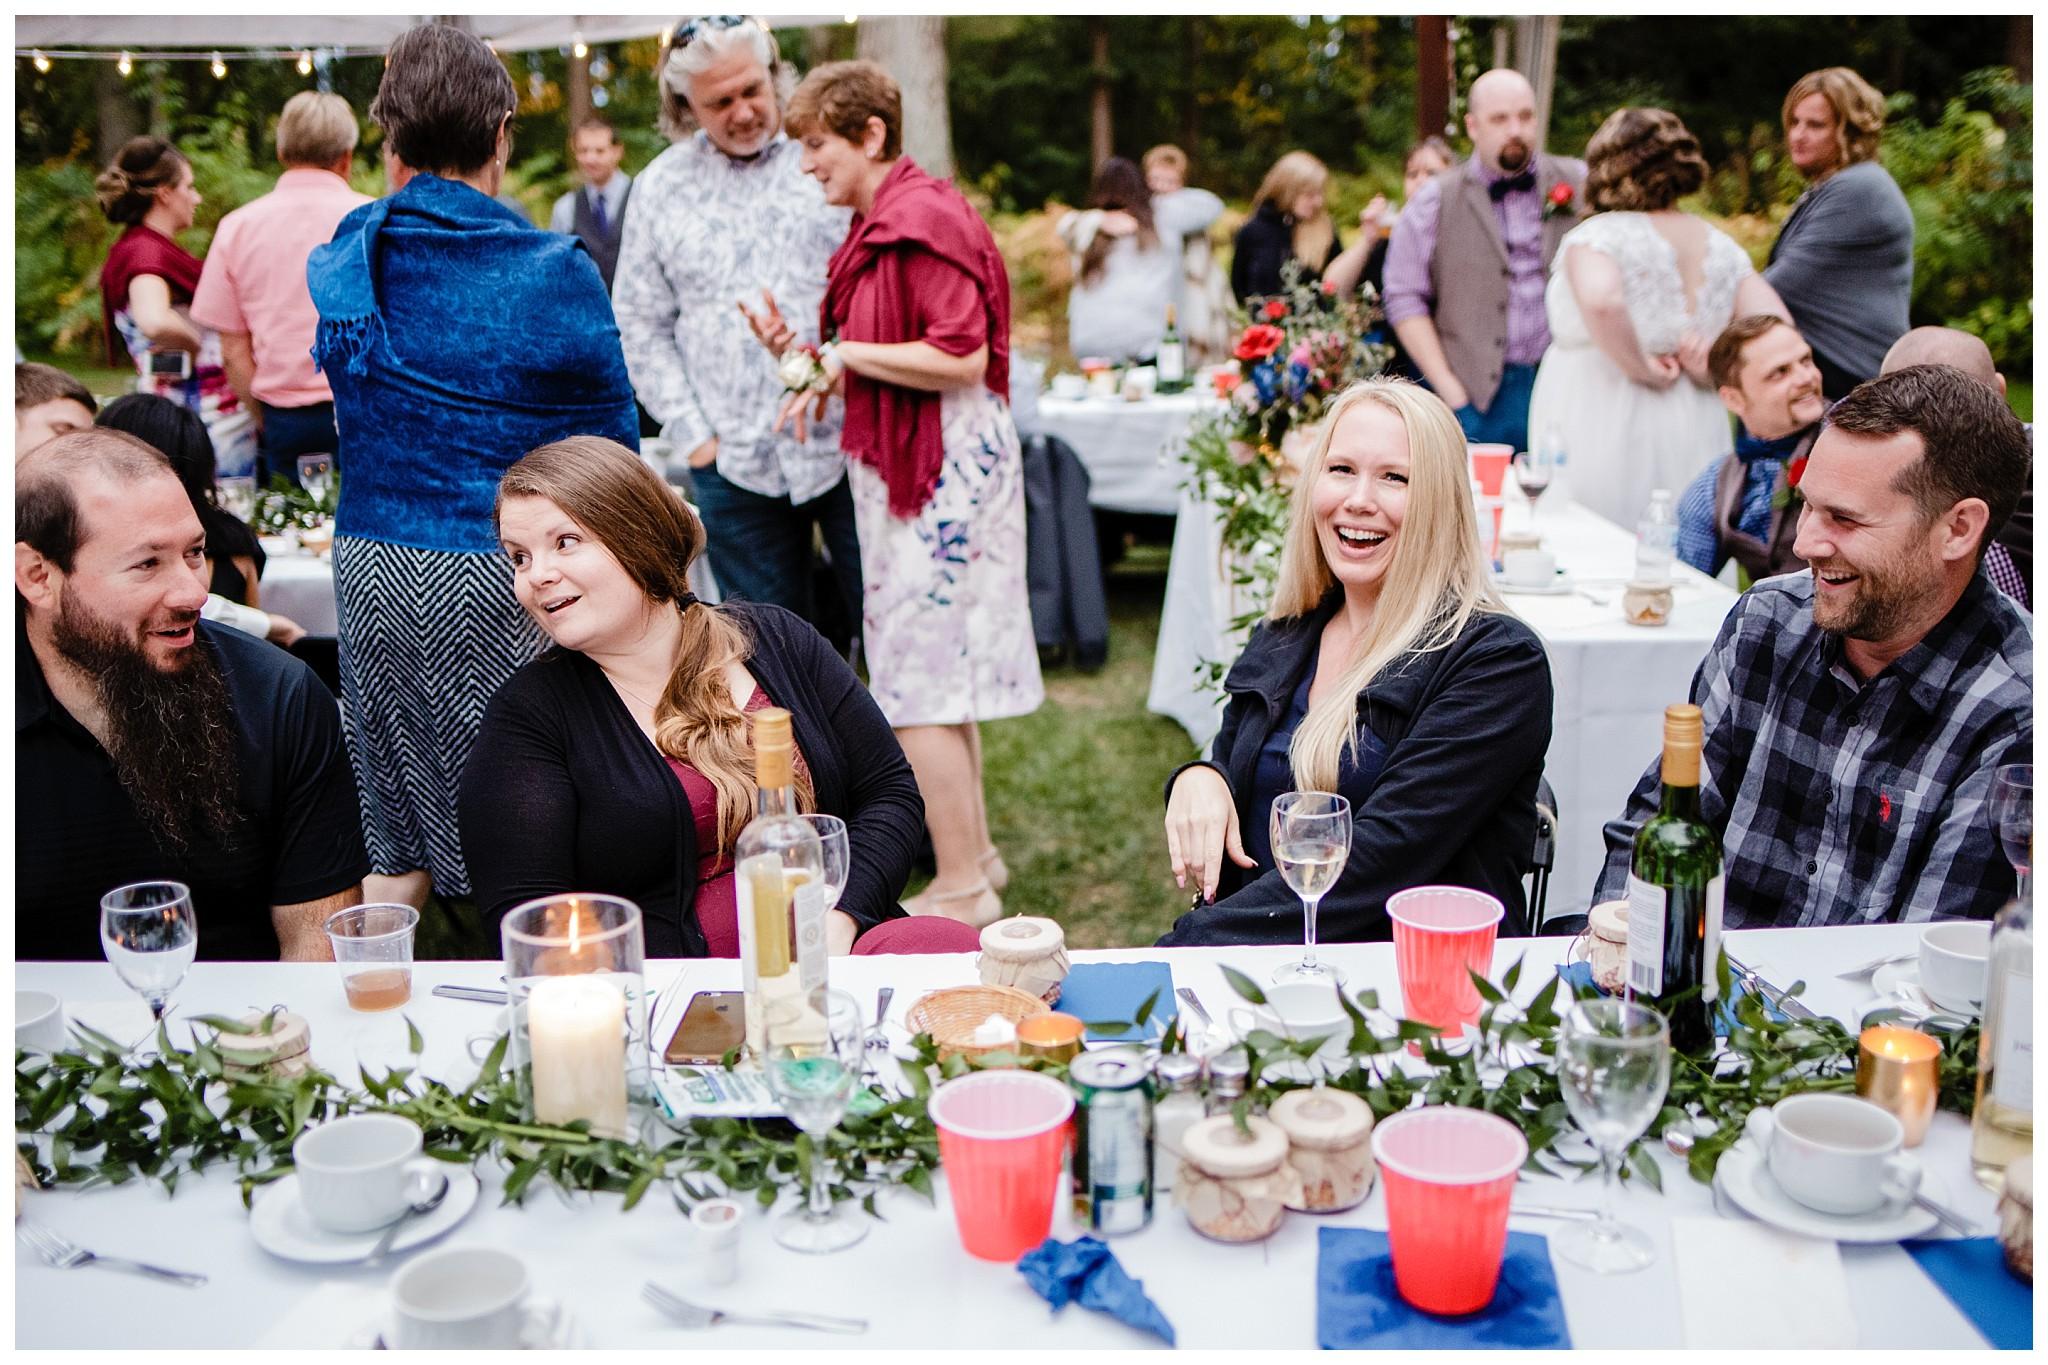 Aldergrove Park Fall Backyard Wedding Photographer Pregnant Bride Tent Outdoor BC Canada Best Wedding Photographer_0049.jpg